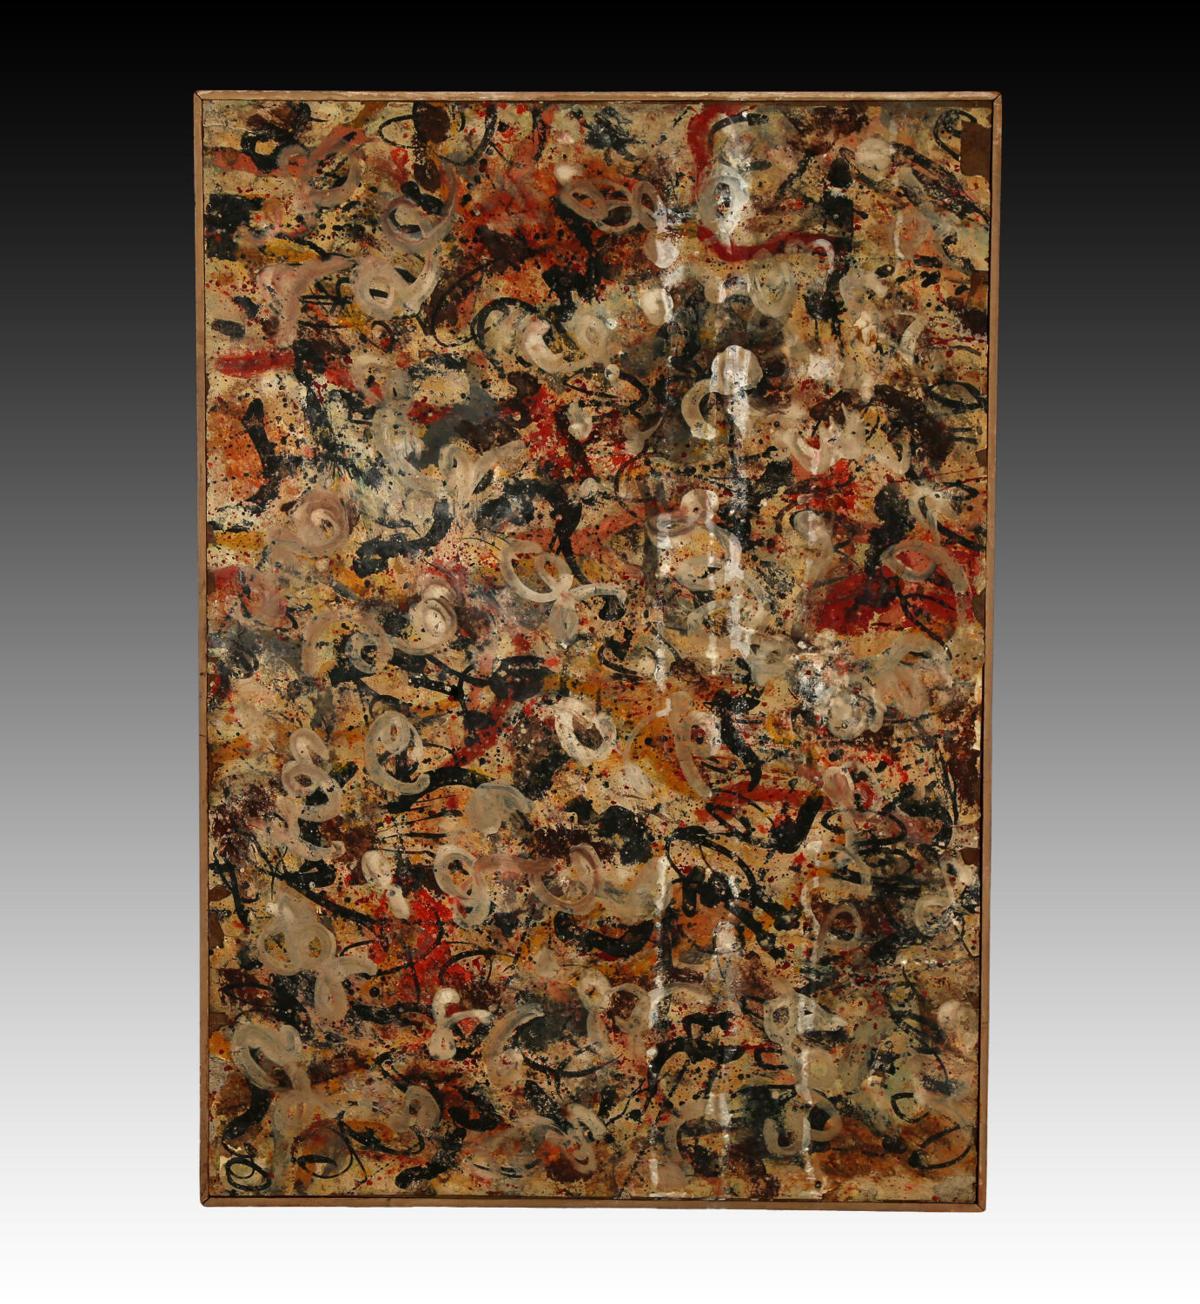 Jackson Pollock gouache painting